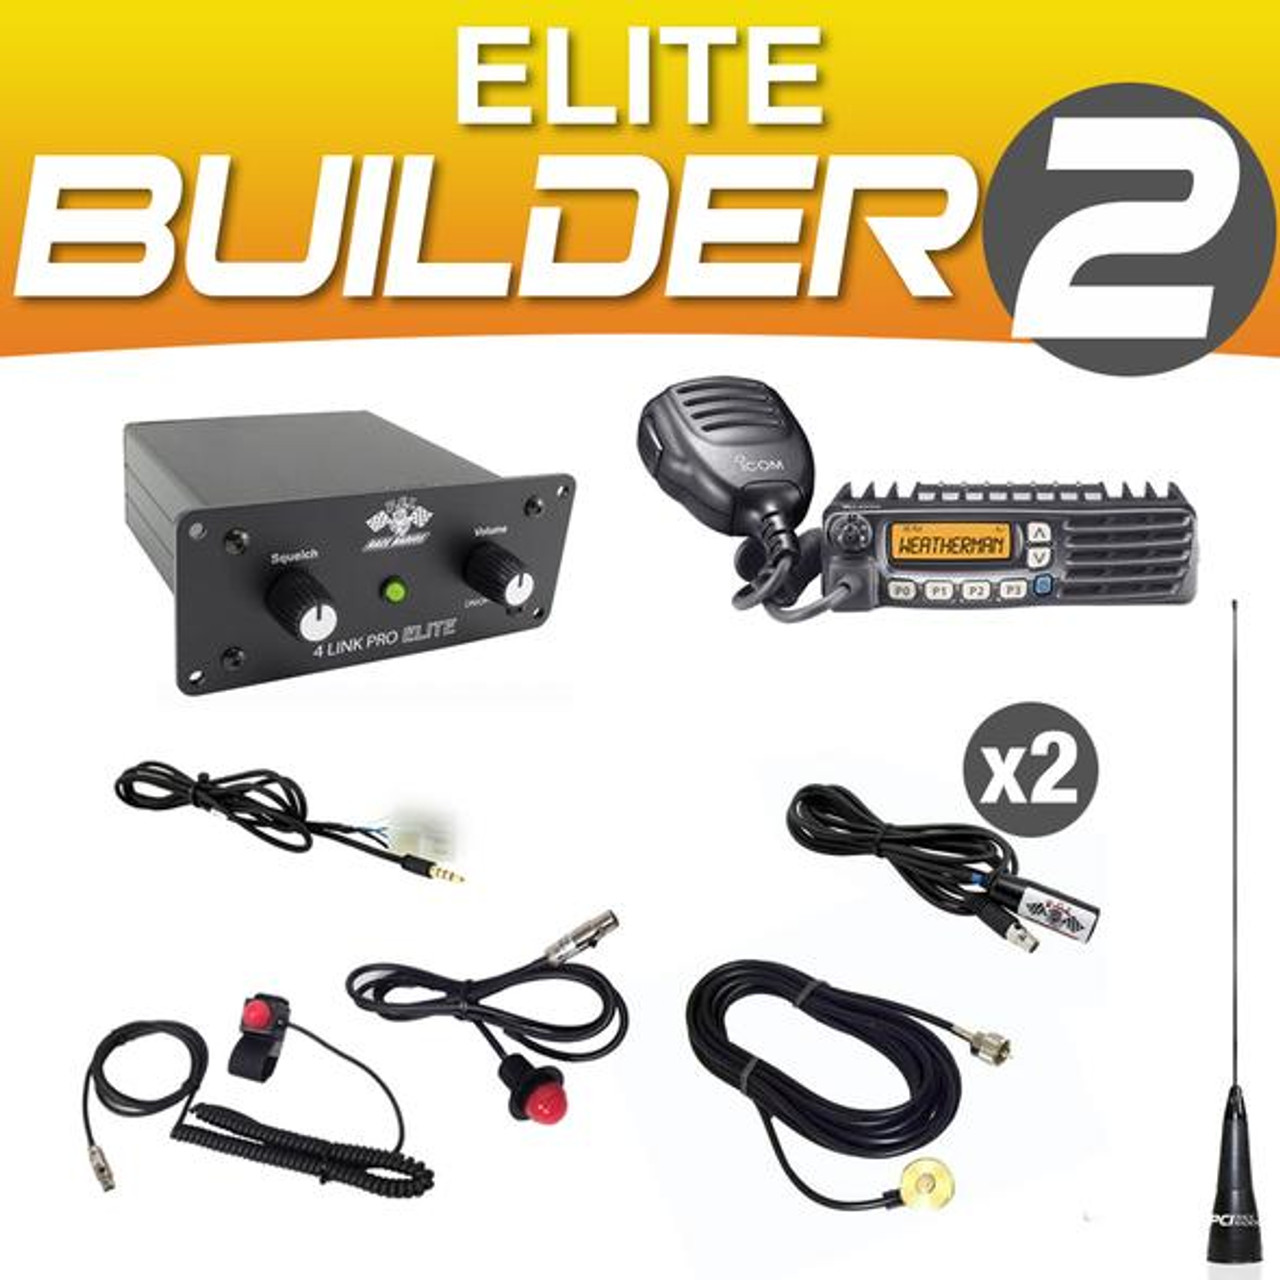 Elite Builder 2